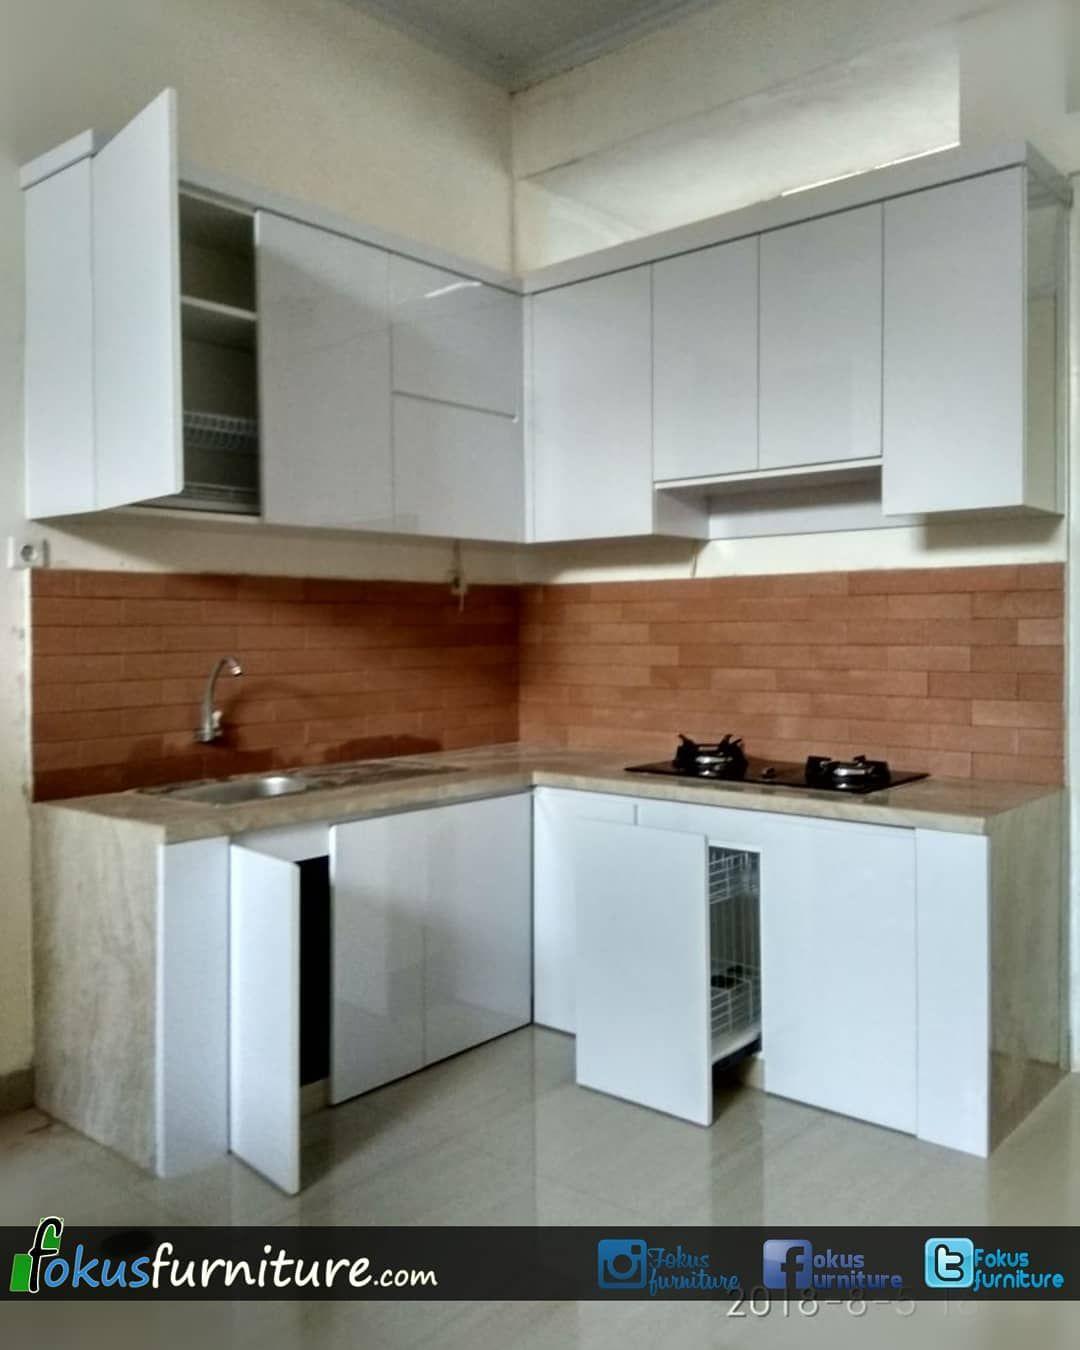 🔵kitchen set lemari dll🔵 di instagram kitchen set letter l dago serpong model model furniture minimalis by fokusfurniture com sedang mencari vendor